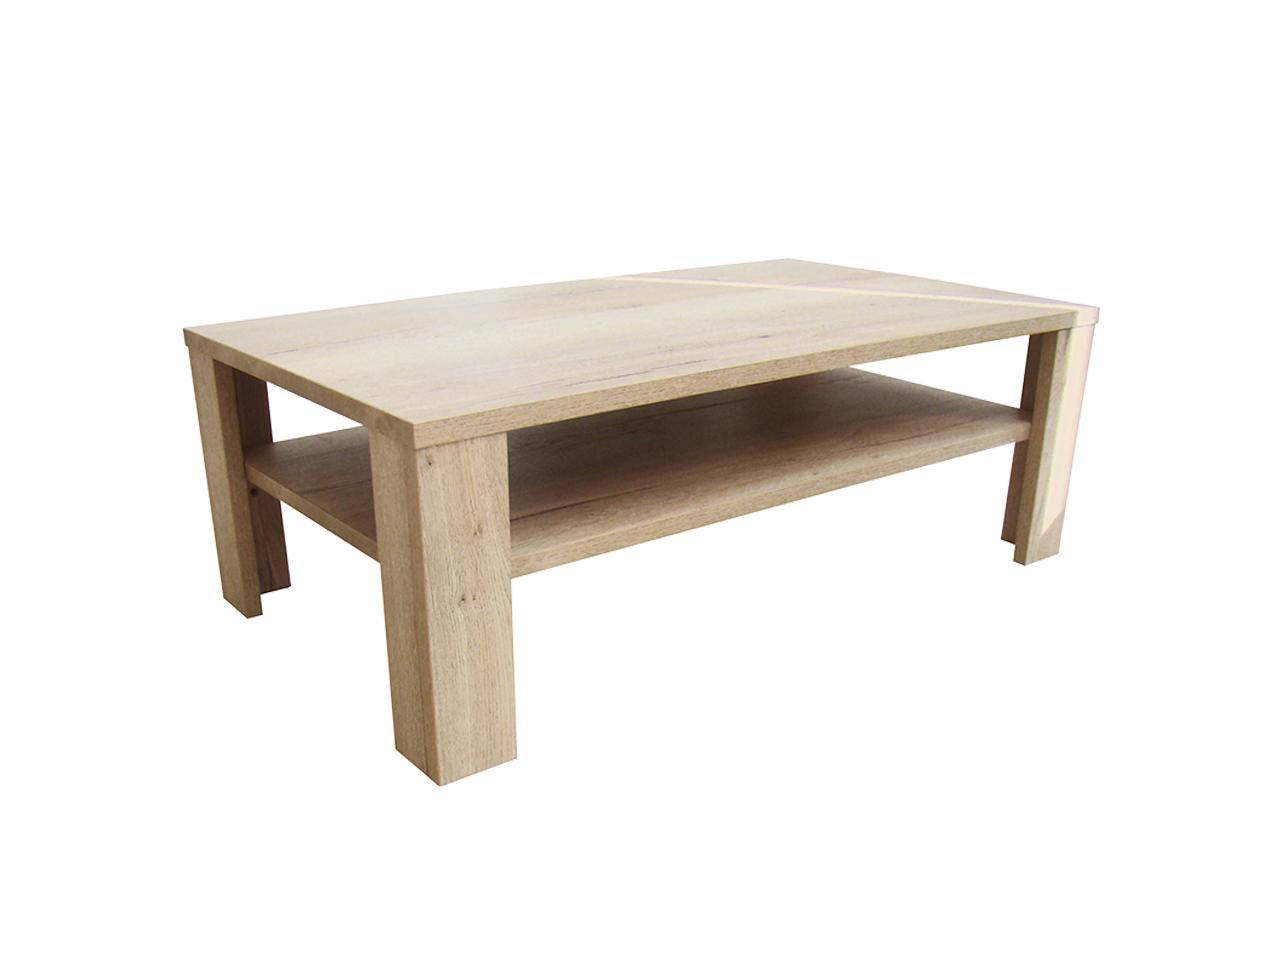 table basse himalaya pieds bois ch ne blanc meubles minet. Black Bedroom Furniture Sets. Home Design Ideas